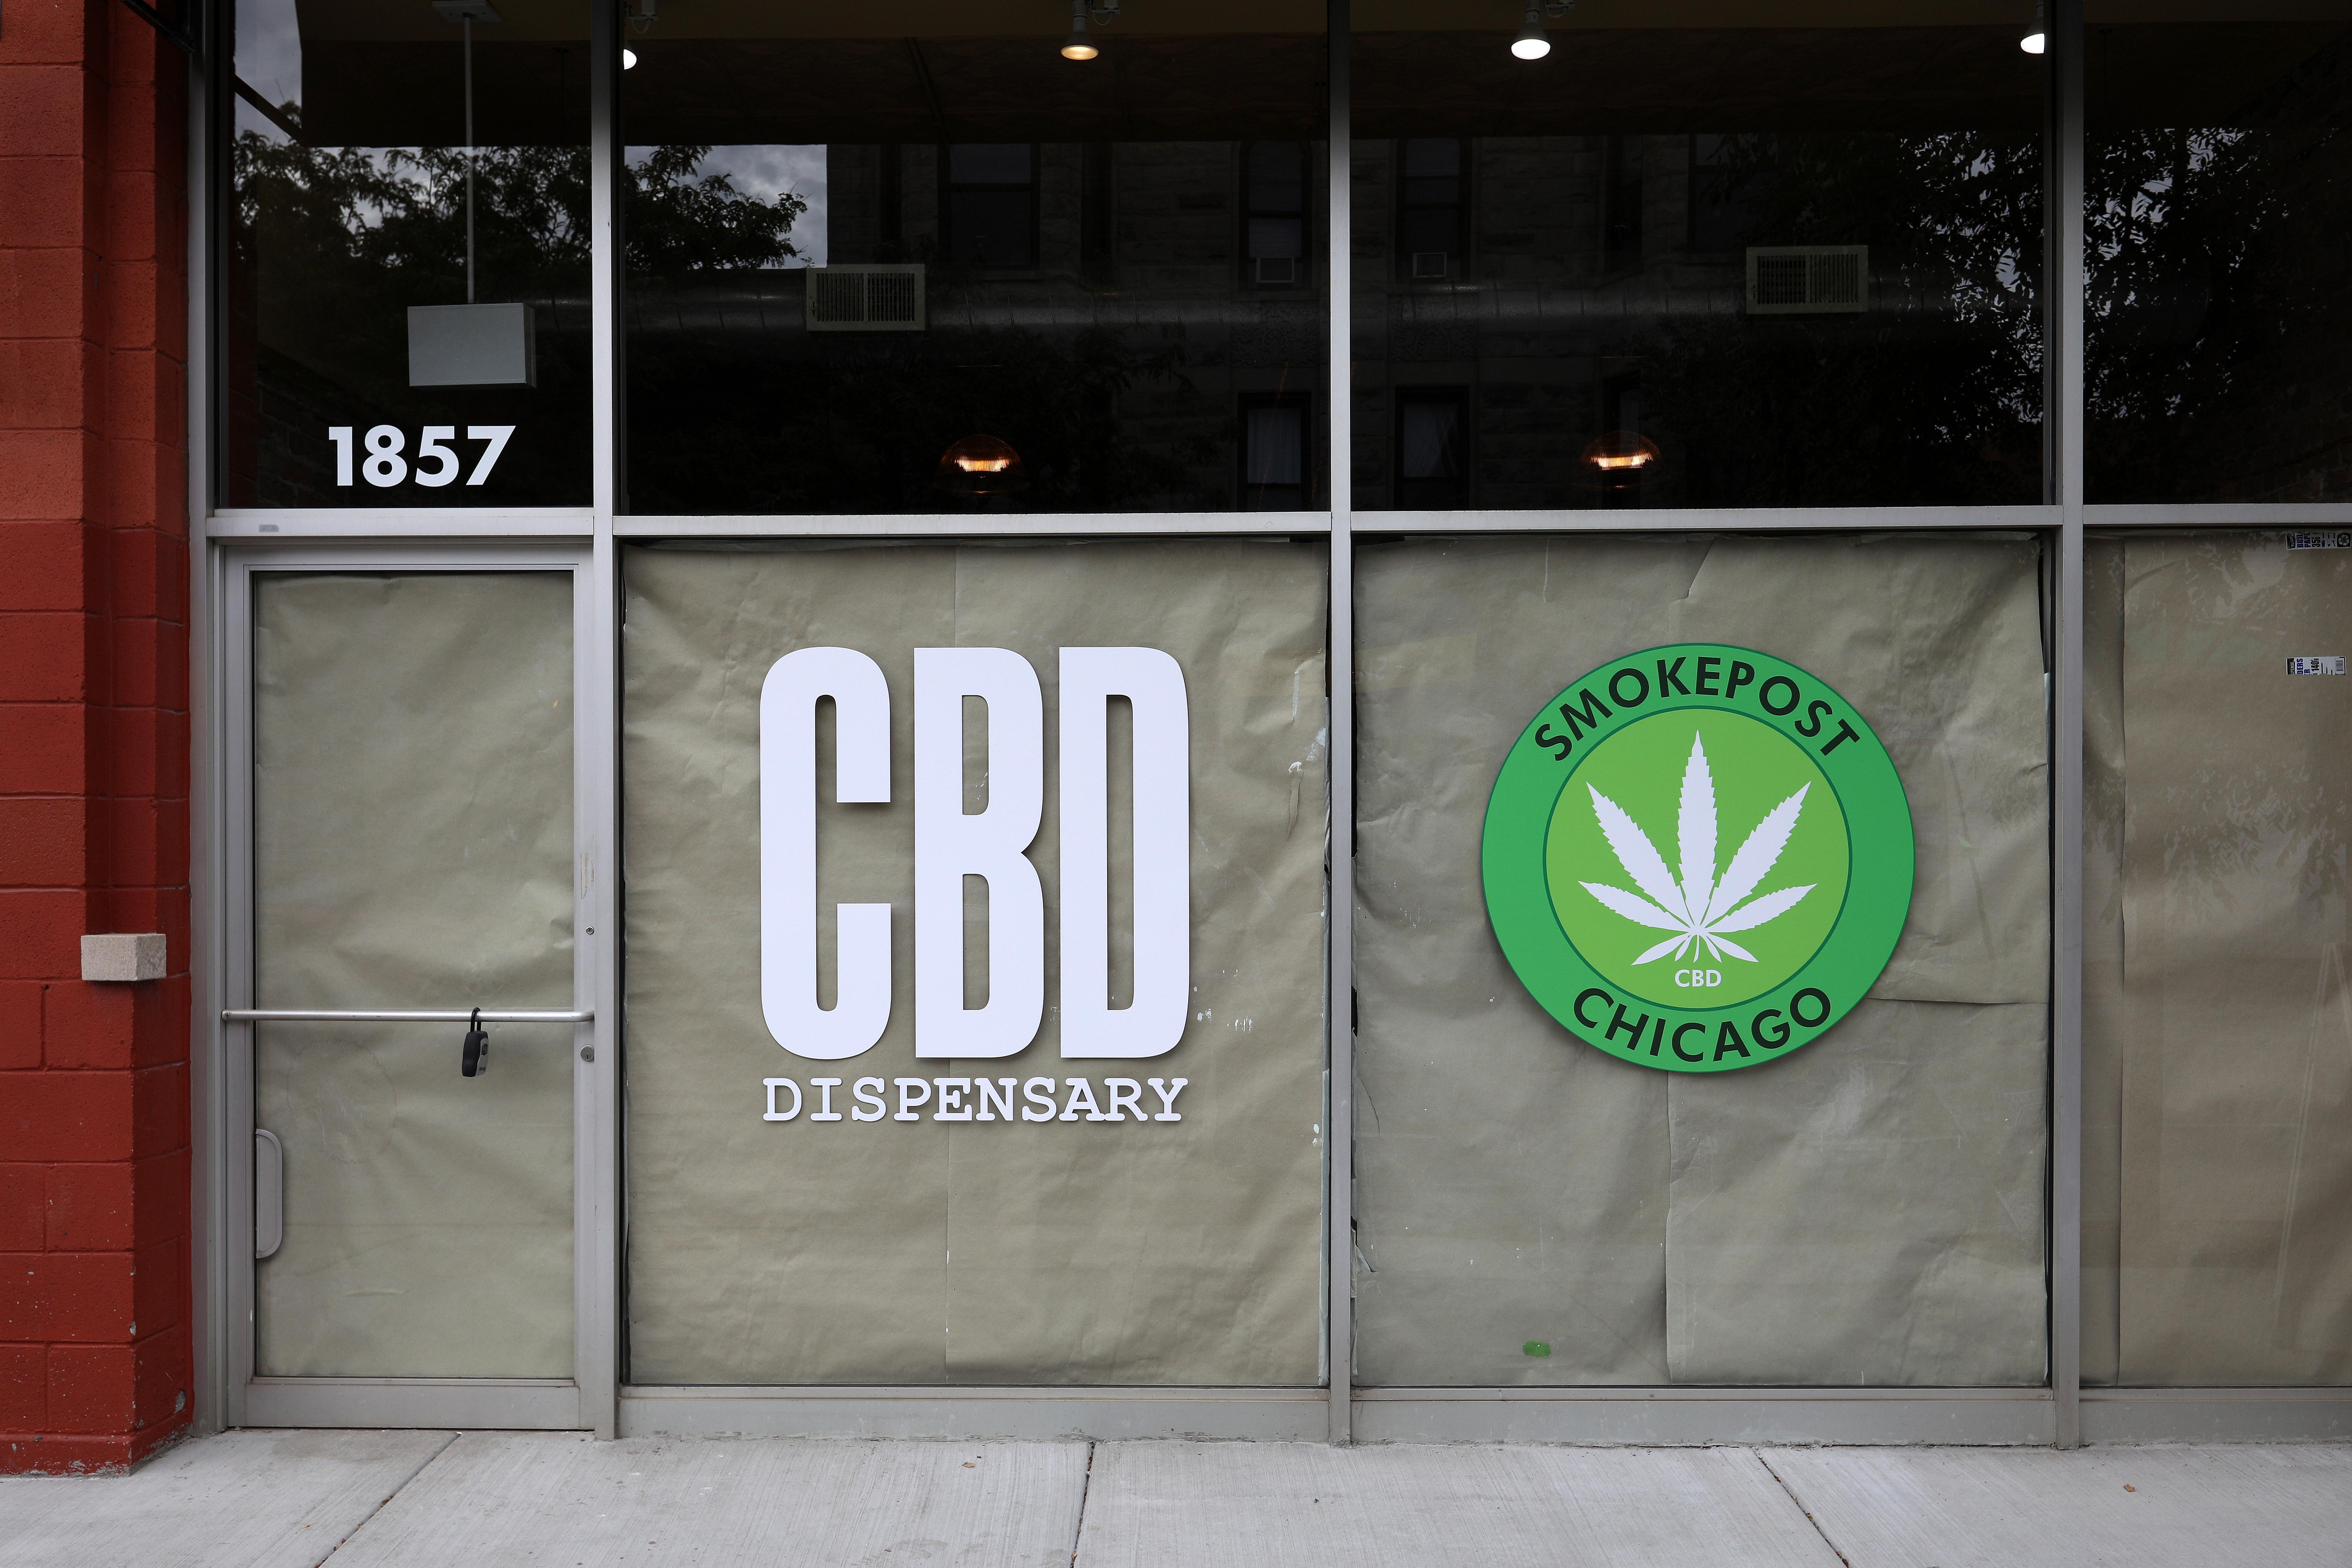 Lightfoot introduces new cannabis ordinance prioritizing 'victimized' communities